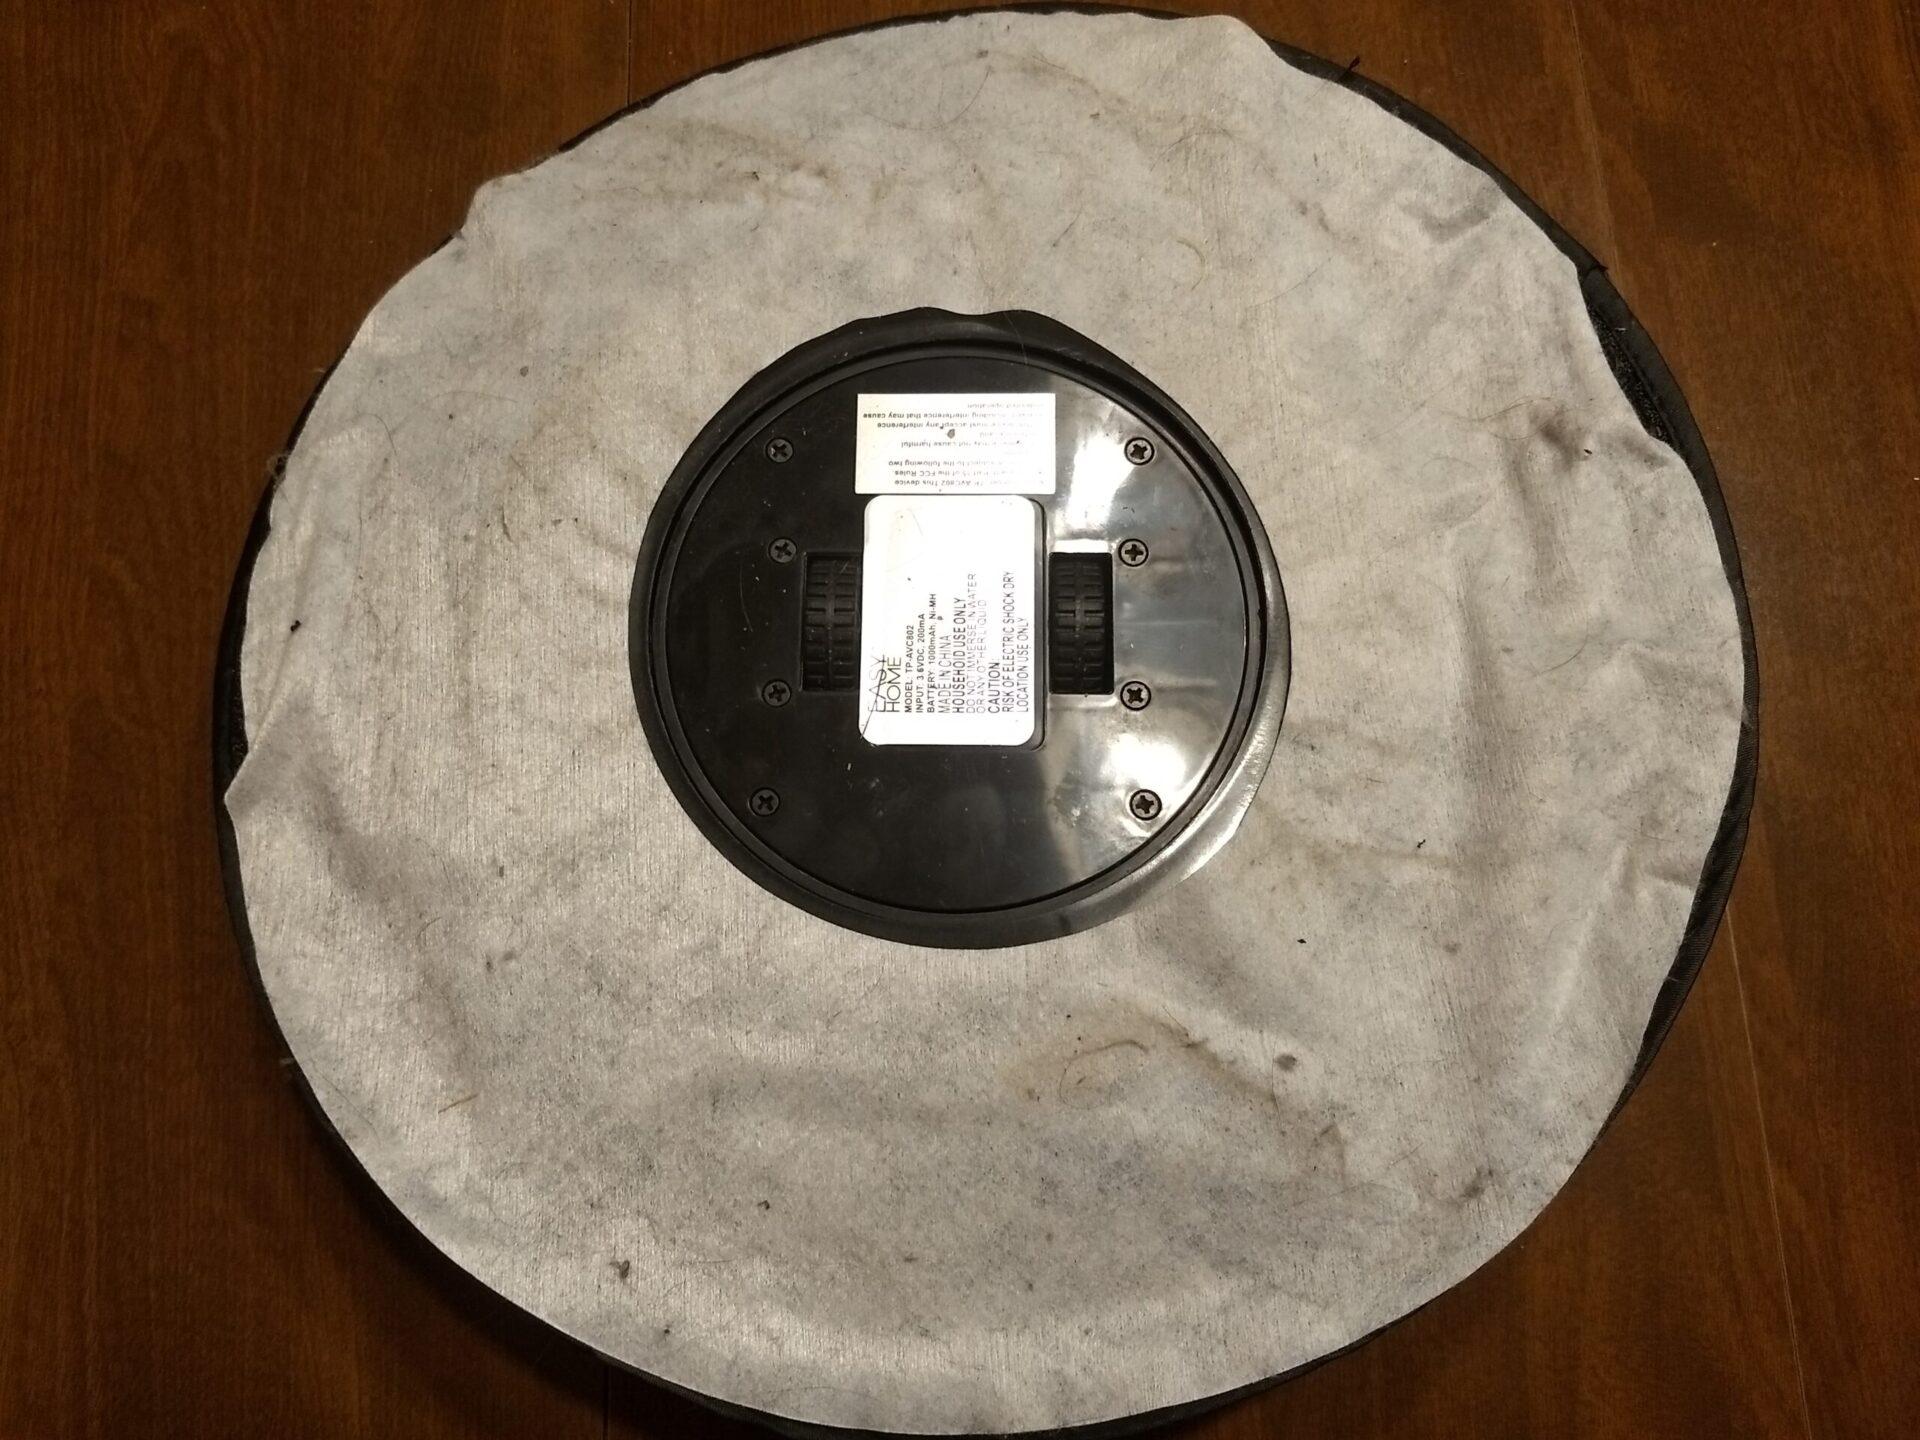 Easy Home Robotic Floor Duster Refills Taraba Home Review